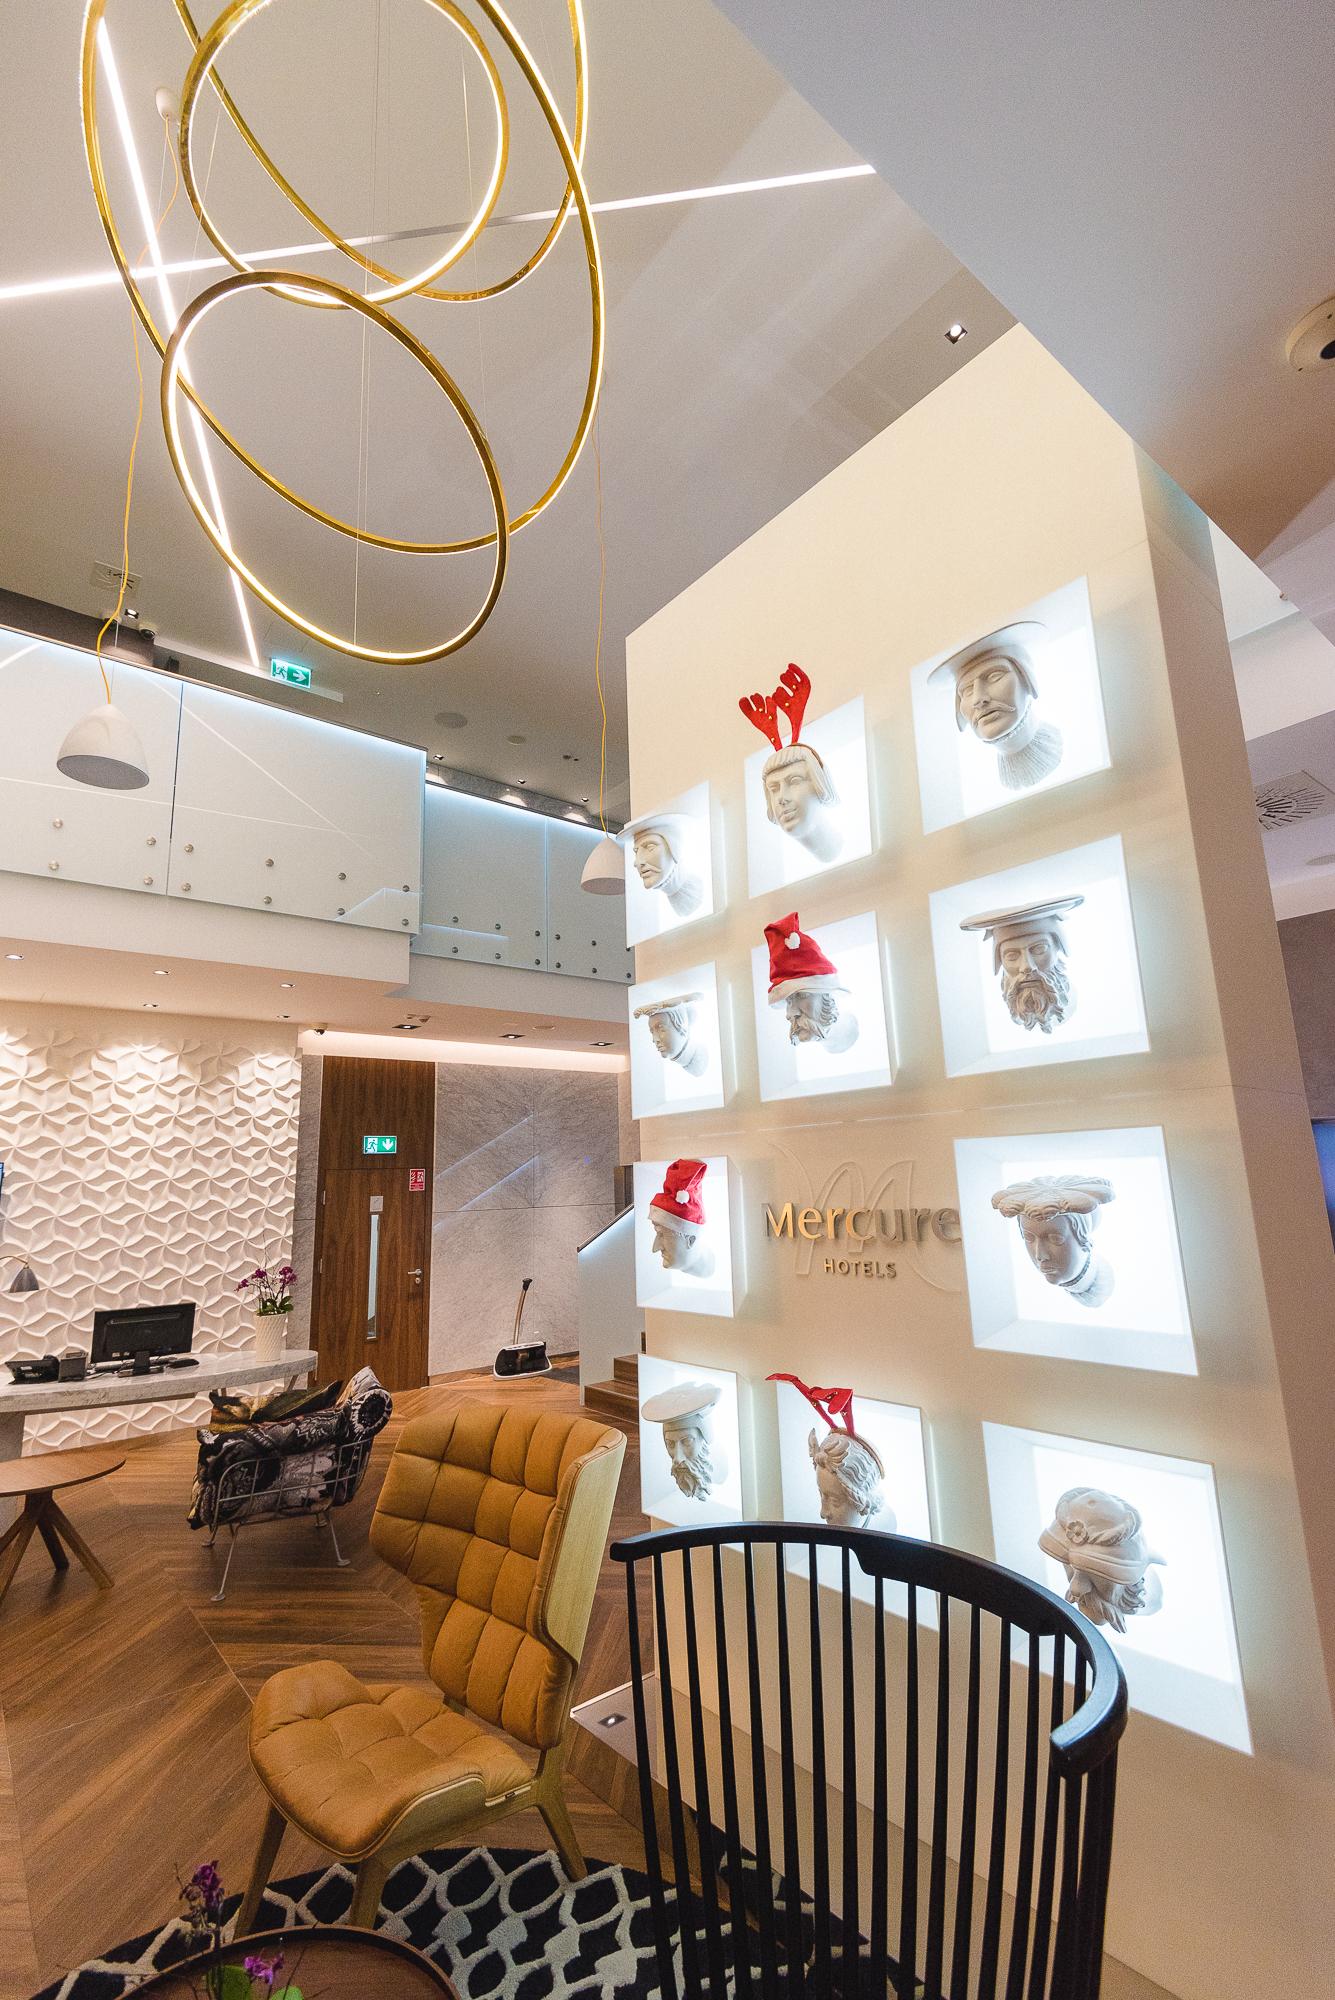 style-plaza-hotel-mercure-krakow-stare-miasto-11